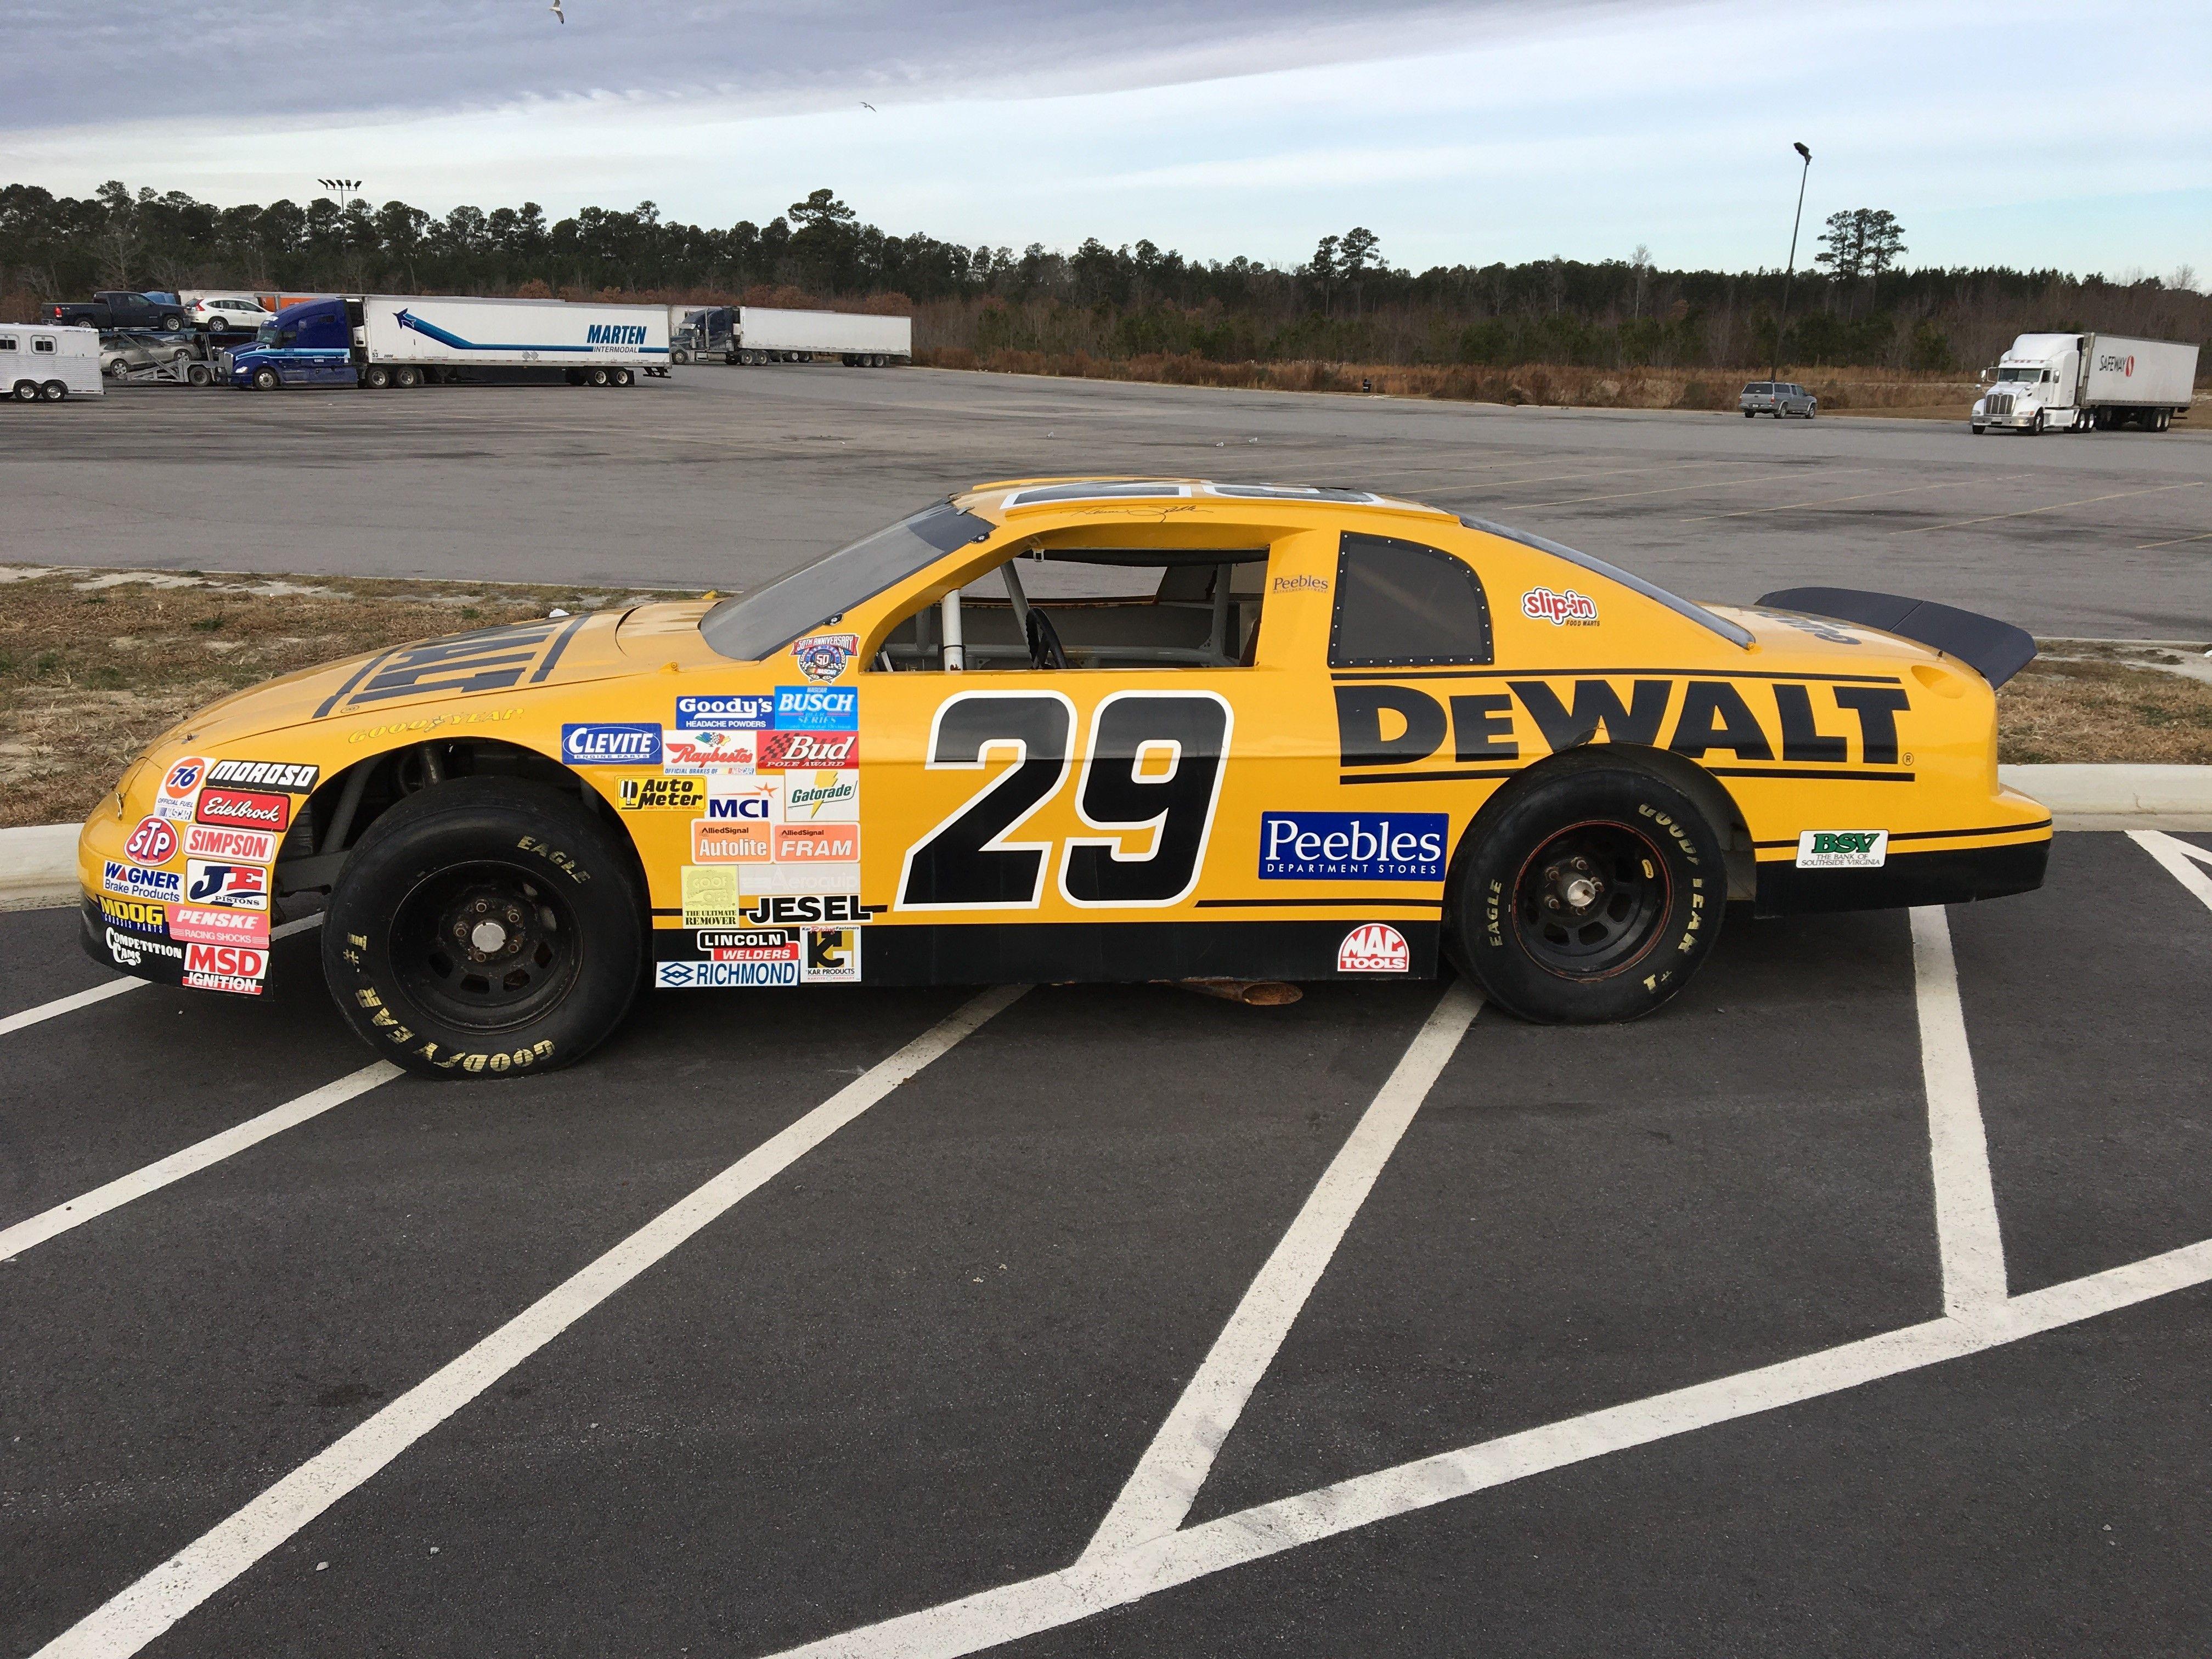 Nascar Racing Car At Shell Gas Station In Virginia